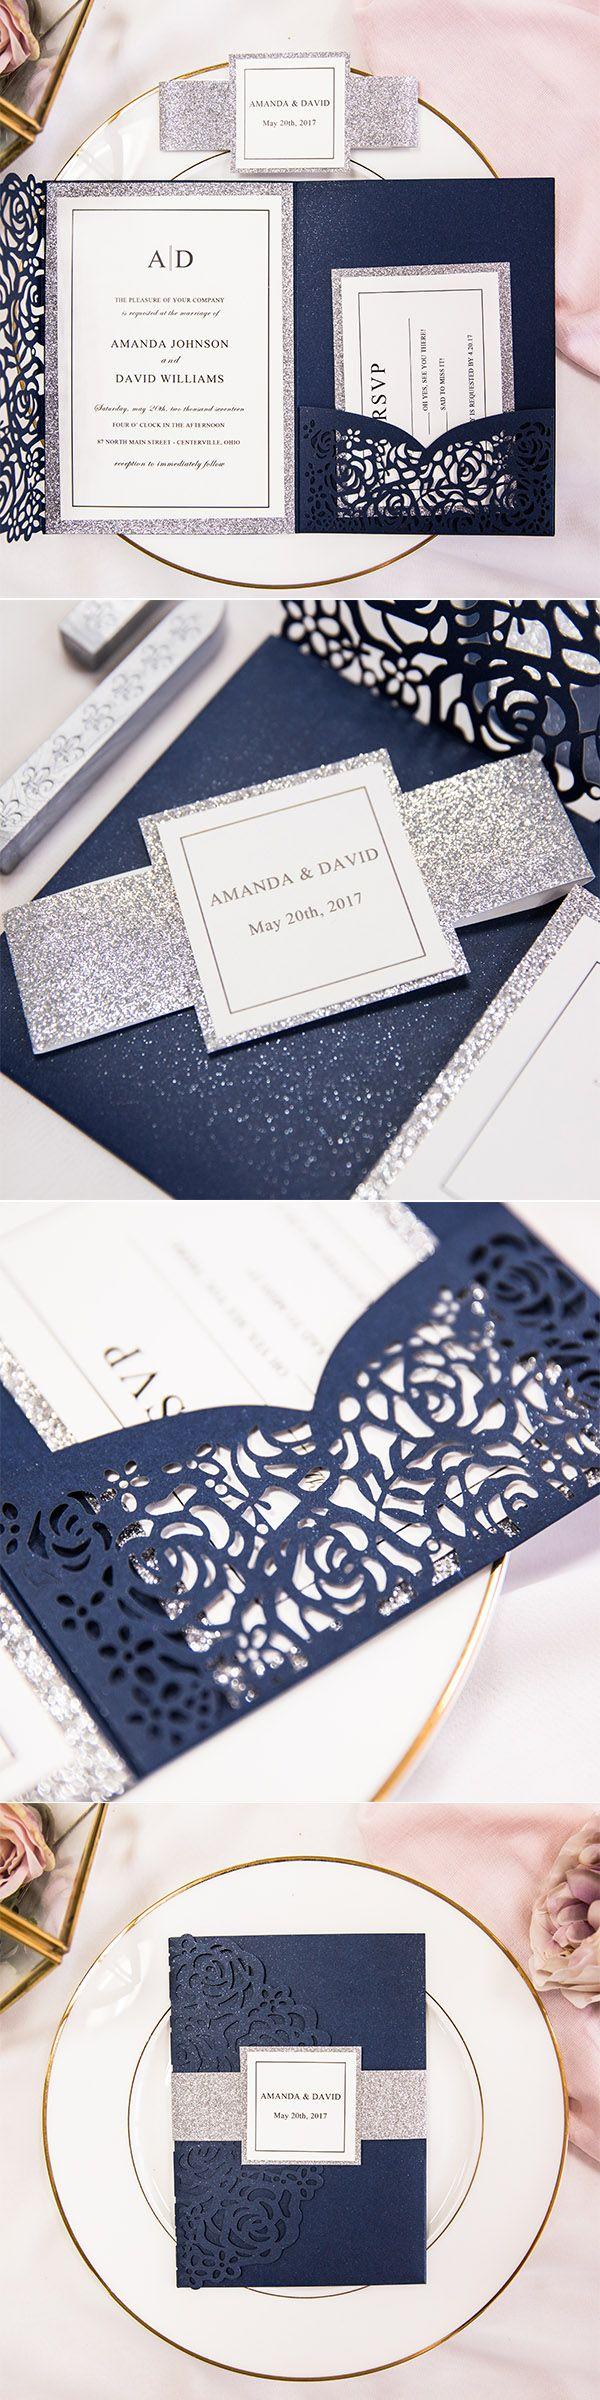 sparkly silver and navy elegant laser cut wedding invitations